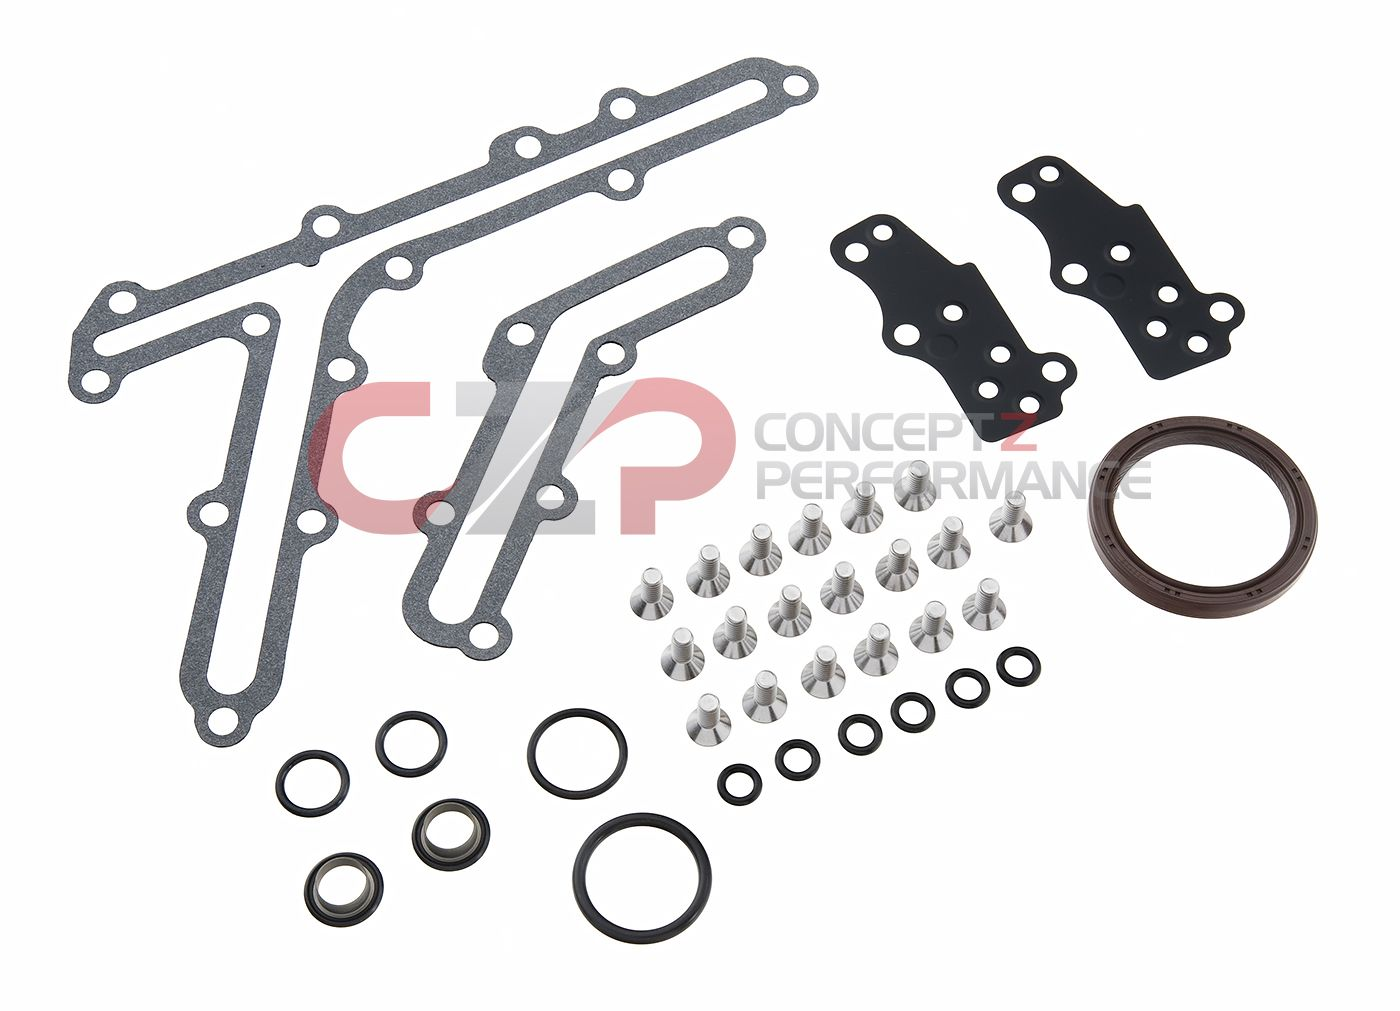 Nissan / Infiniti Infiniti OEM / CZP Timing Cover Gasket/O-Ring Kit, VQ35DE  Non Rev-Up Engine ONLY - Nissan 350Z / Infiniti G35 NONREVTMNGCVR-KT -